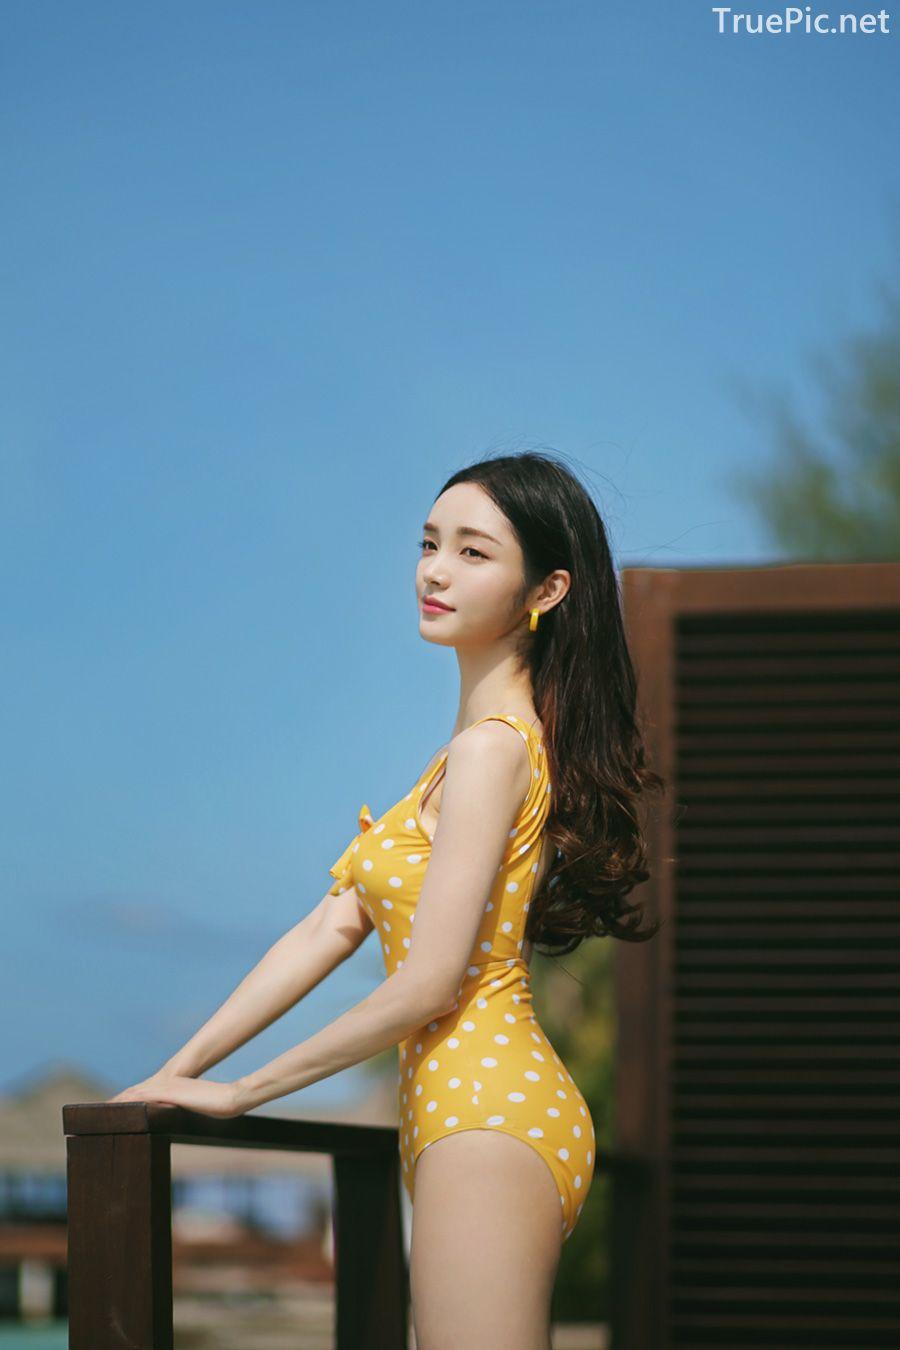 Korean fashion model Jeong Hee - Everyone once a monokini - Picture 11